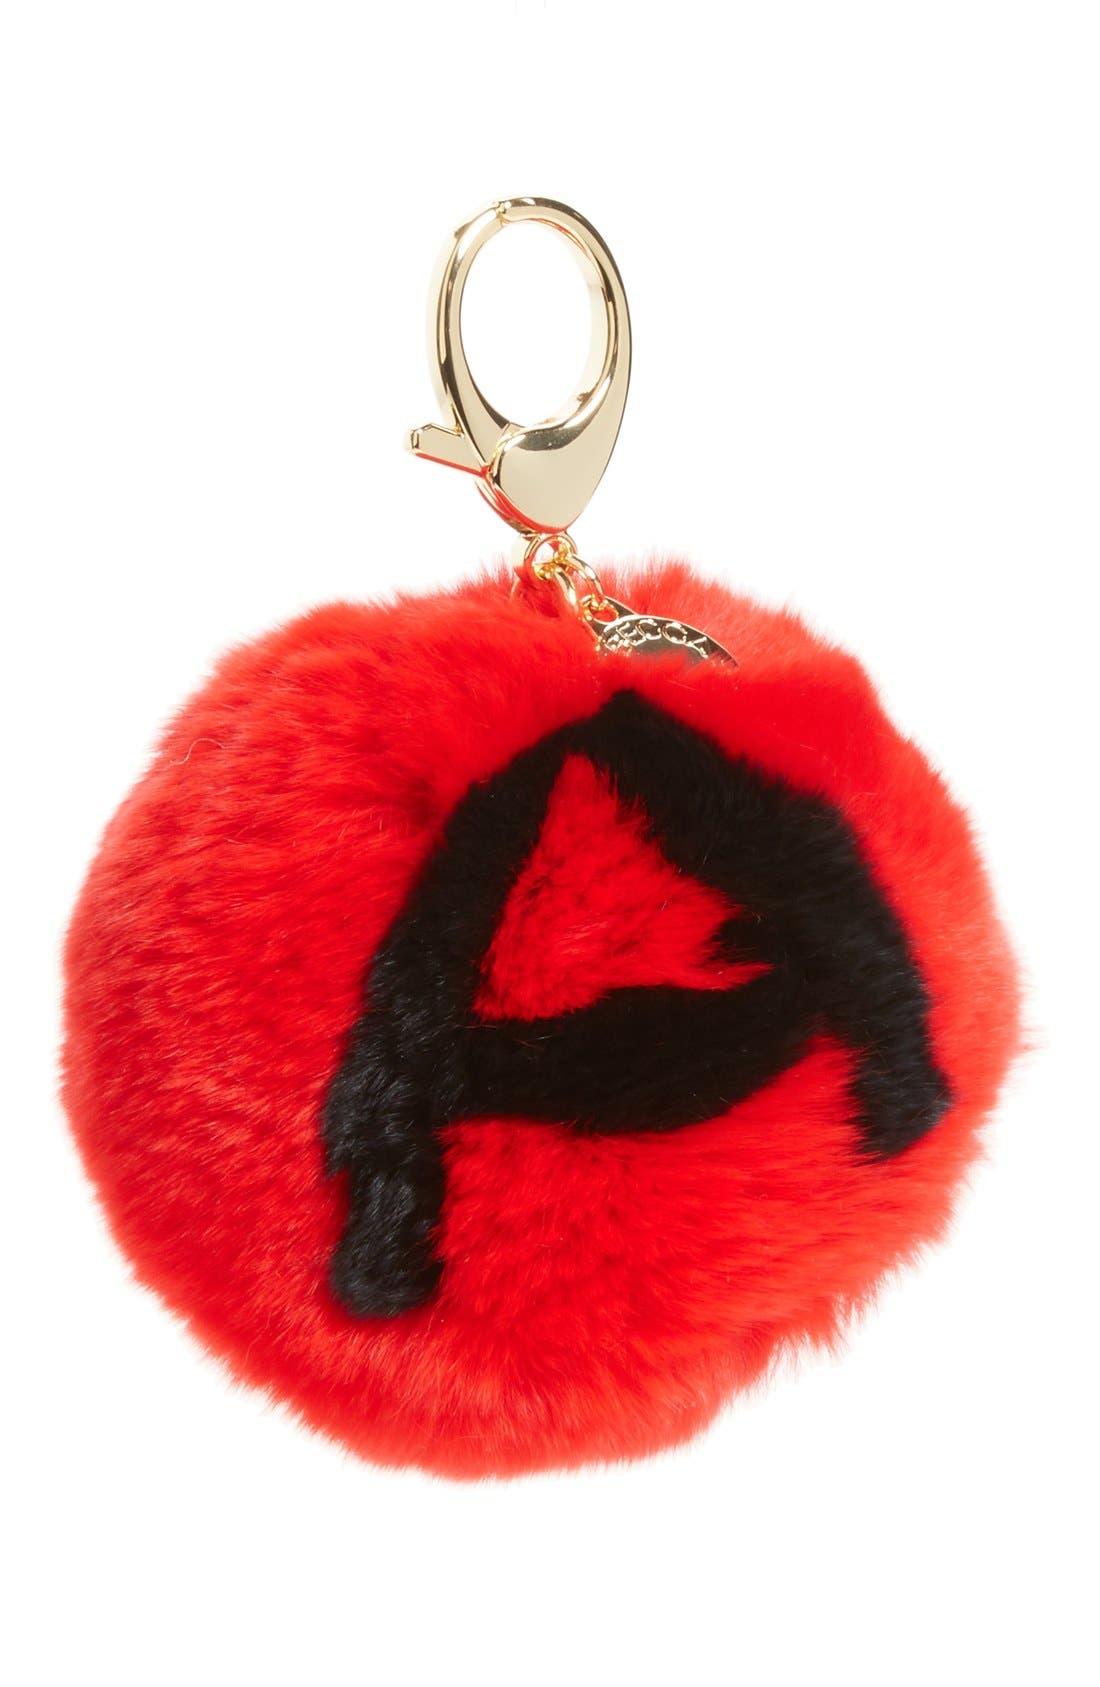 Alternate Image 1 Selected - Rebecca Minkoff Genuine Rabbit Fur Initial Pom Bag Charm